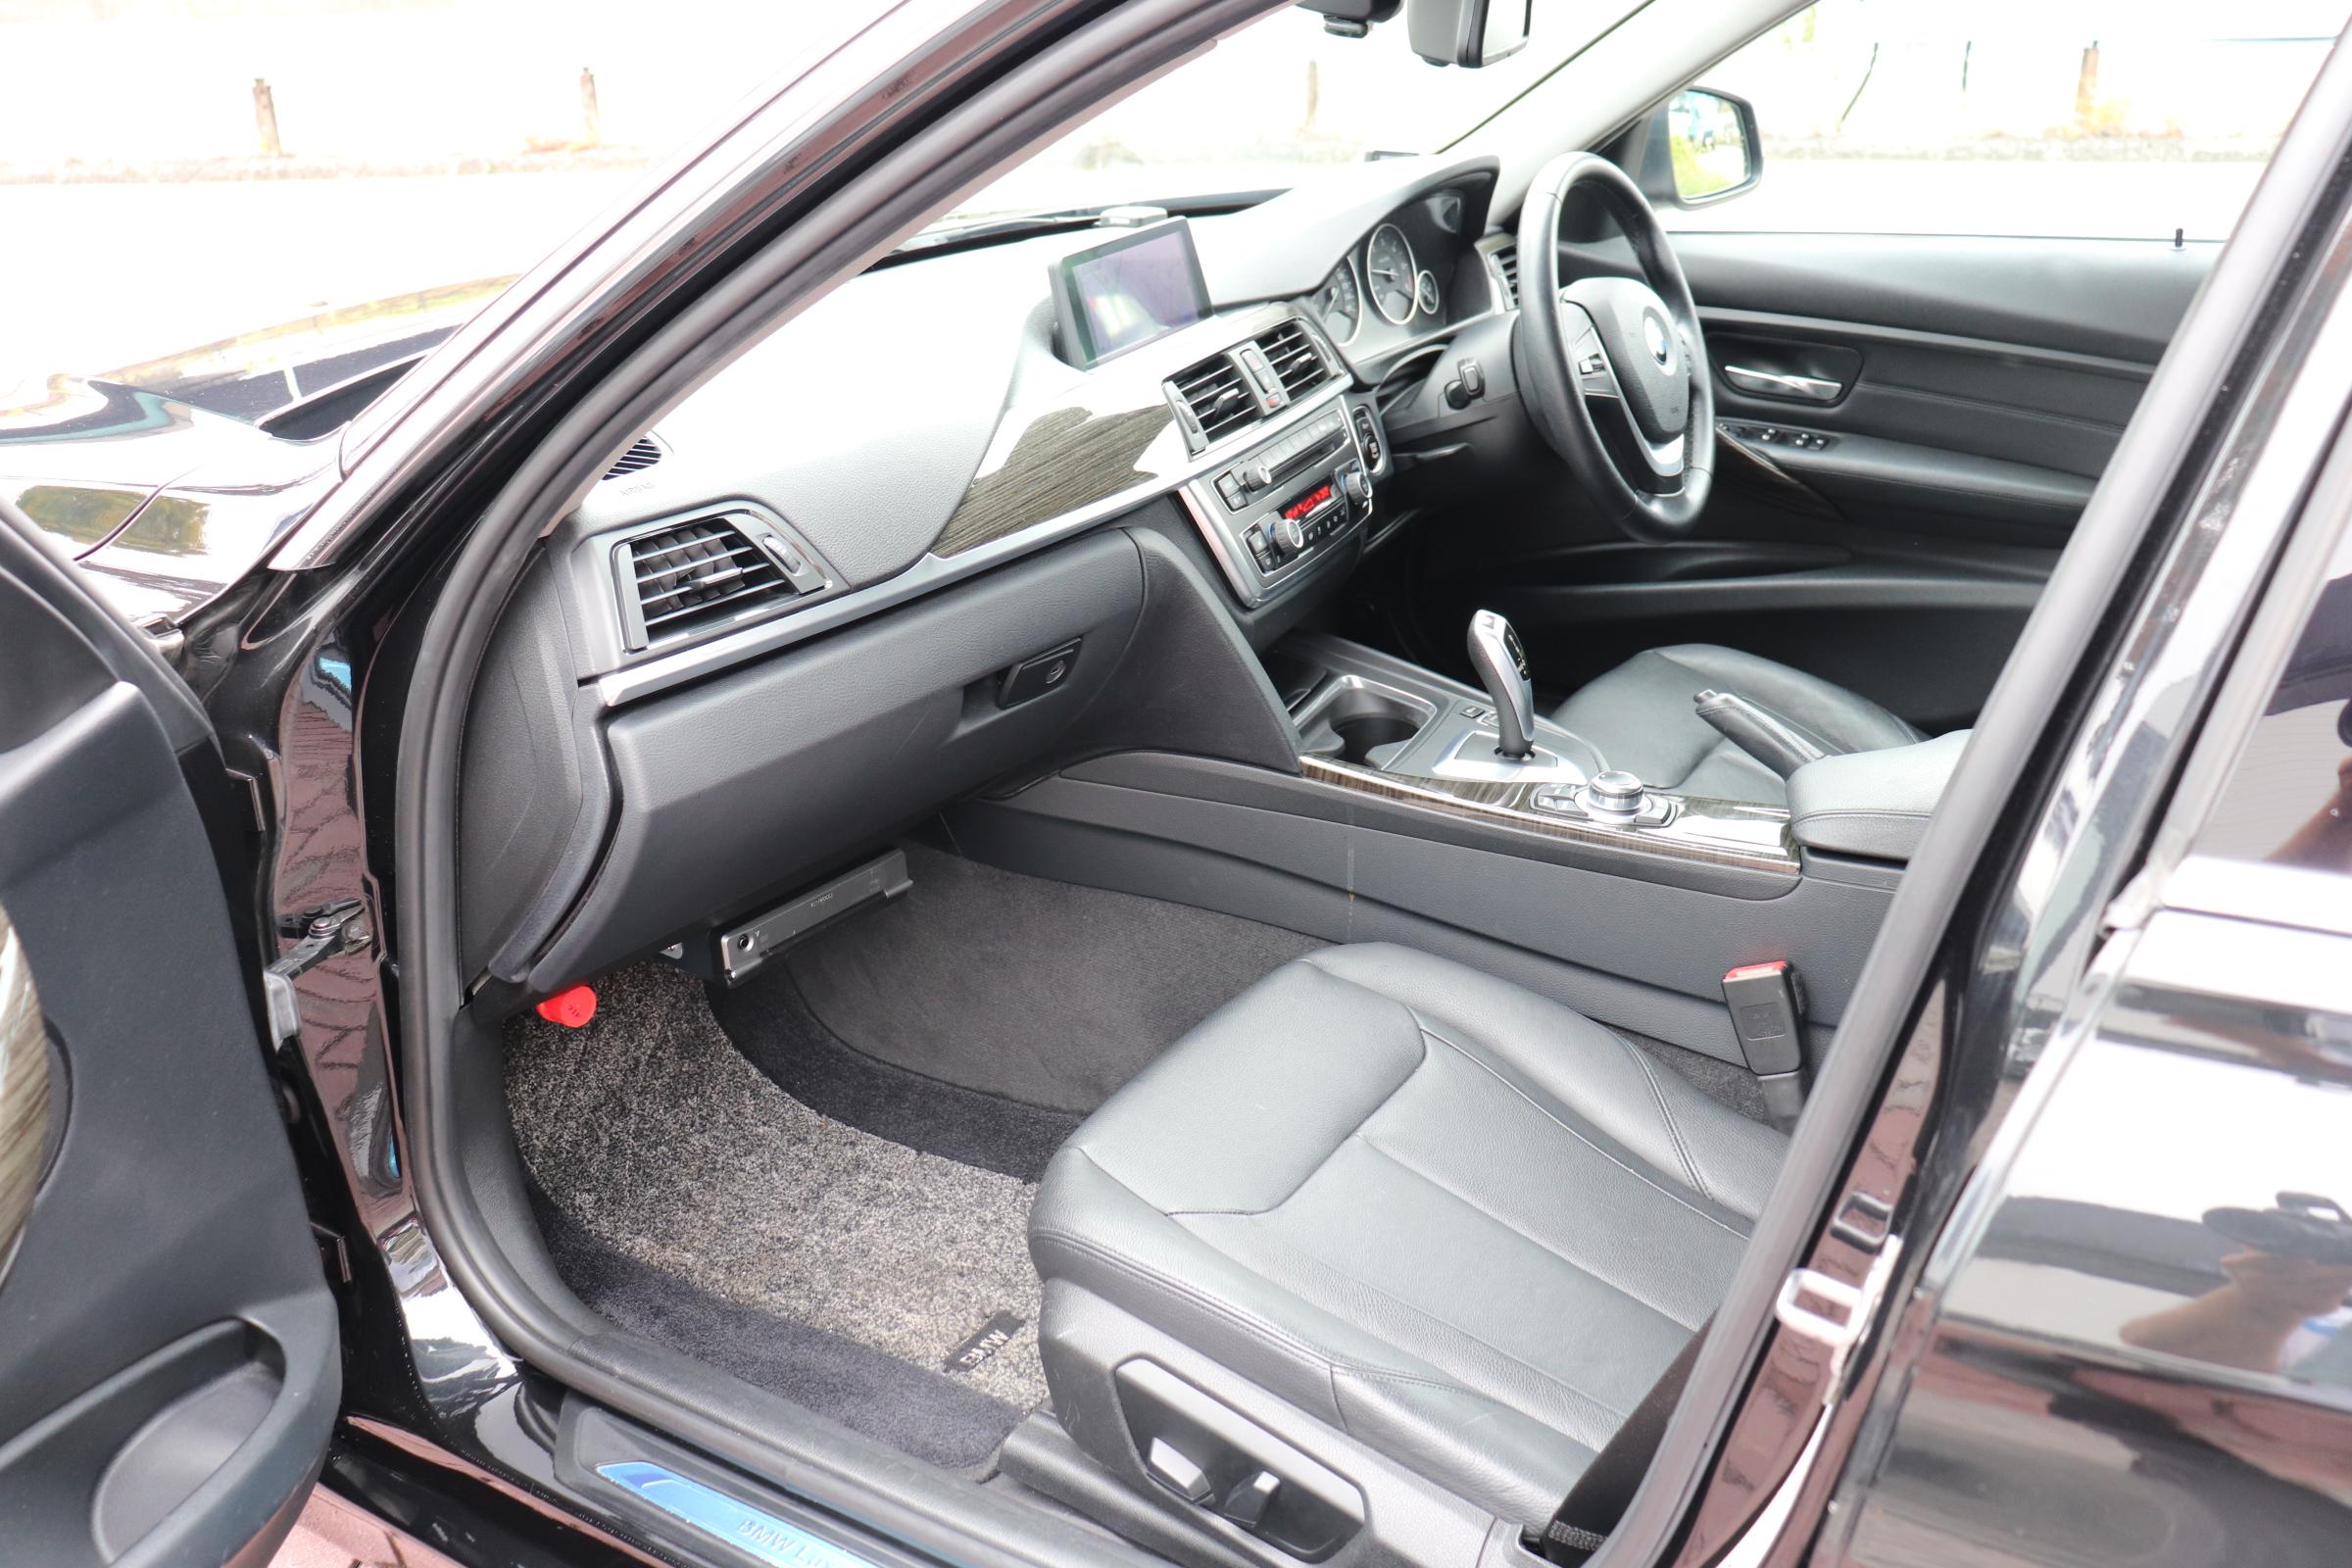 320dツーリングラグジュアリー ブラックレザー 4シリーズラグジュアリー用18インチAW車両画像13